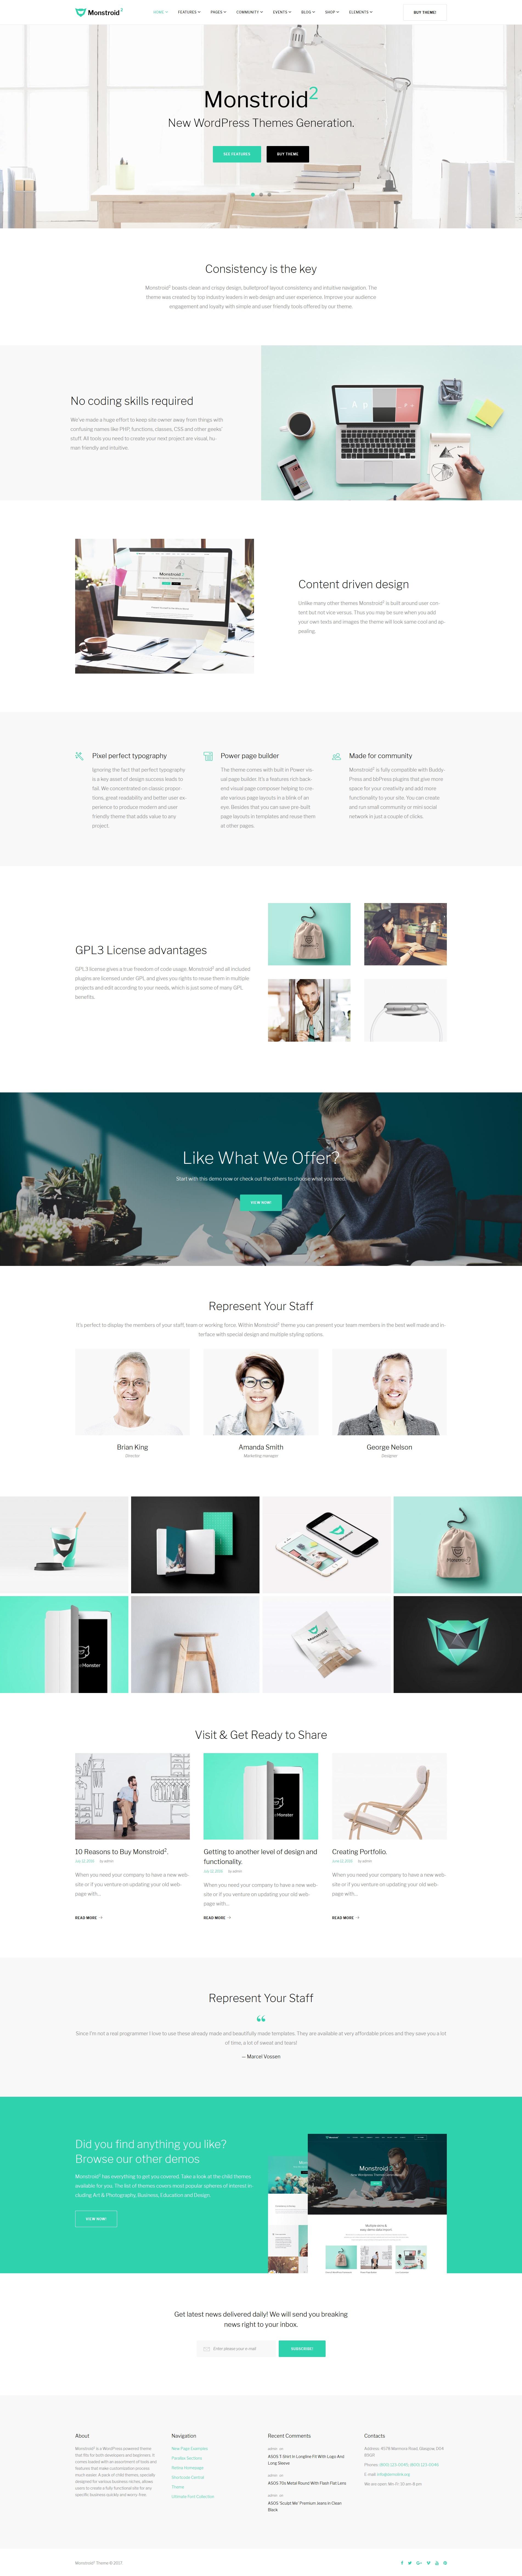 Website Design Template 62222 - concept clean corporate creative business page builder ecommerce portfolio unique premium professional modern